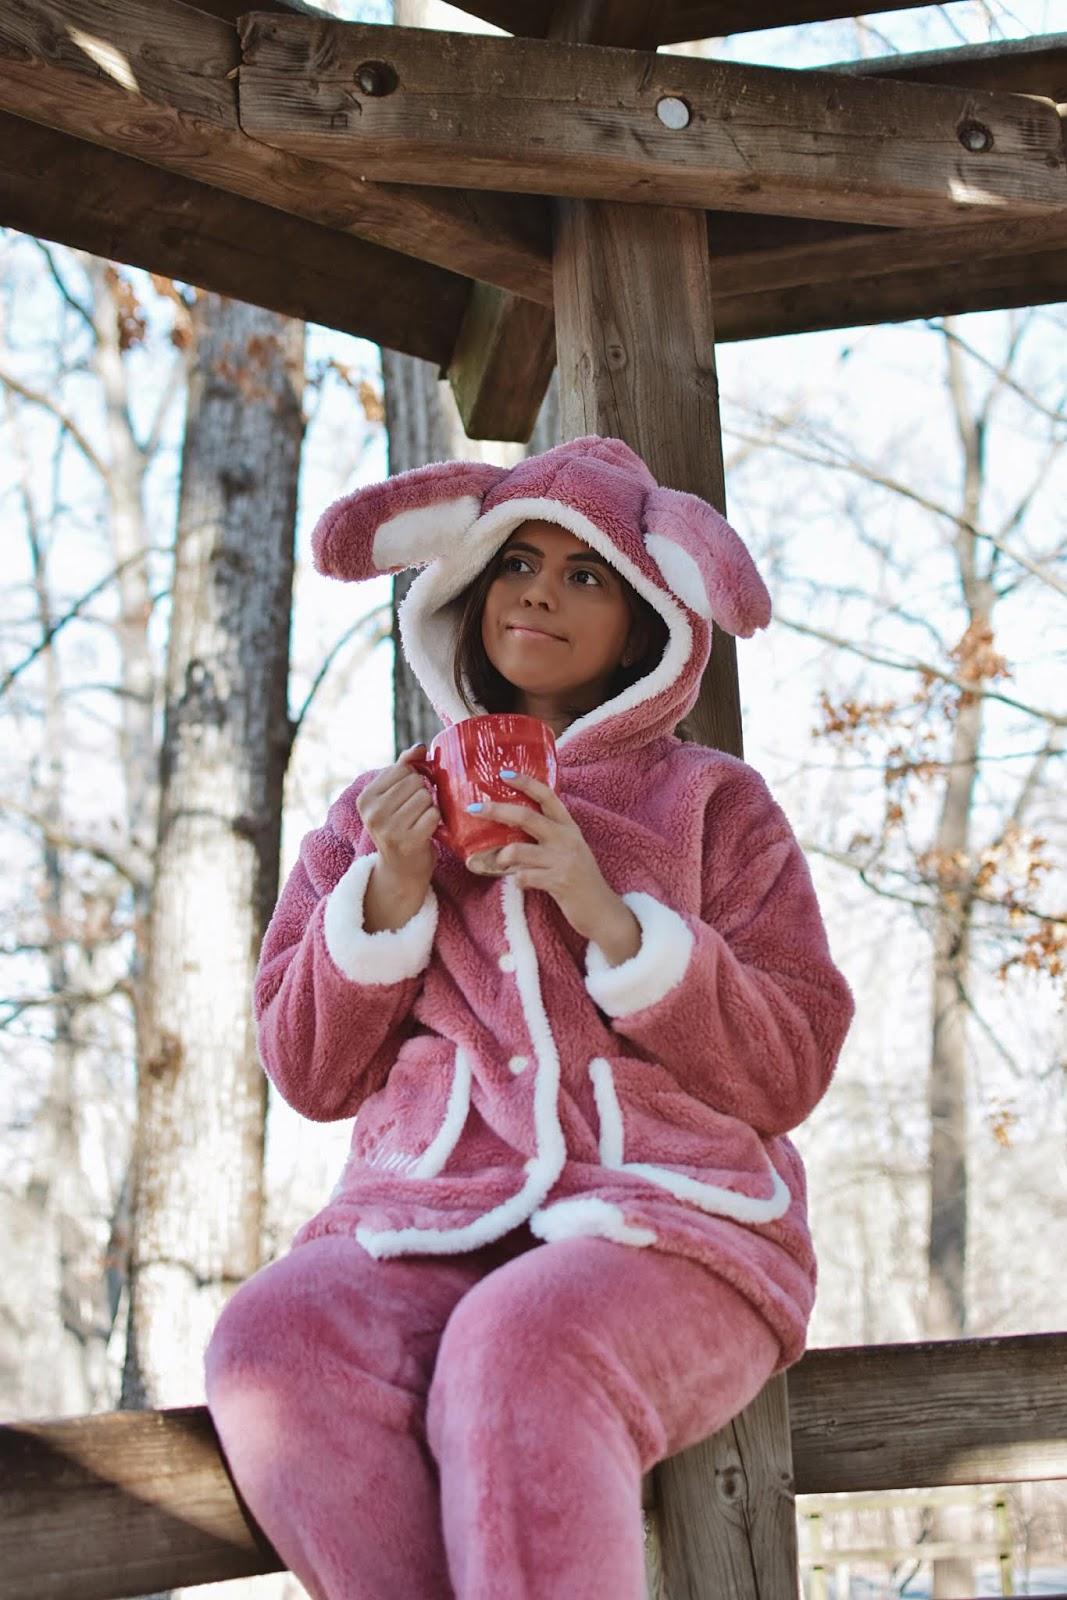 Rabbit Ear Plush Hooded PJ Set by Mari Estilo-dcblogger-sheingals-winterstyle-pijamas divertidas-pijamas a la moda-marisolflamenco-